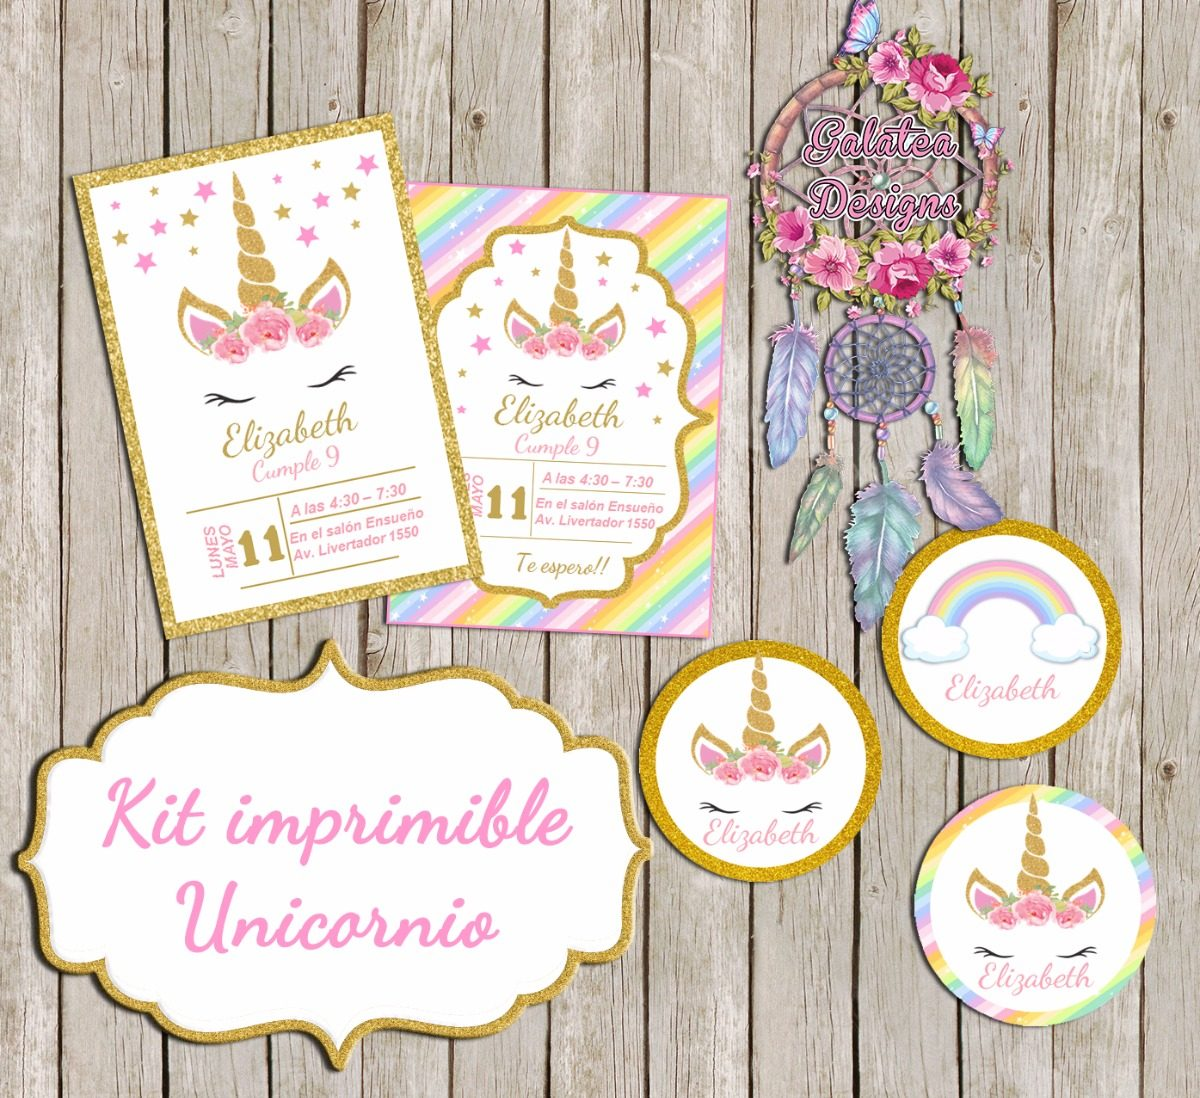 Kit Imprimible Unicornio Tarjetas Cumple 2 Kit $ 200,00 en Mercado L